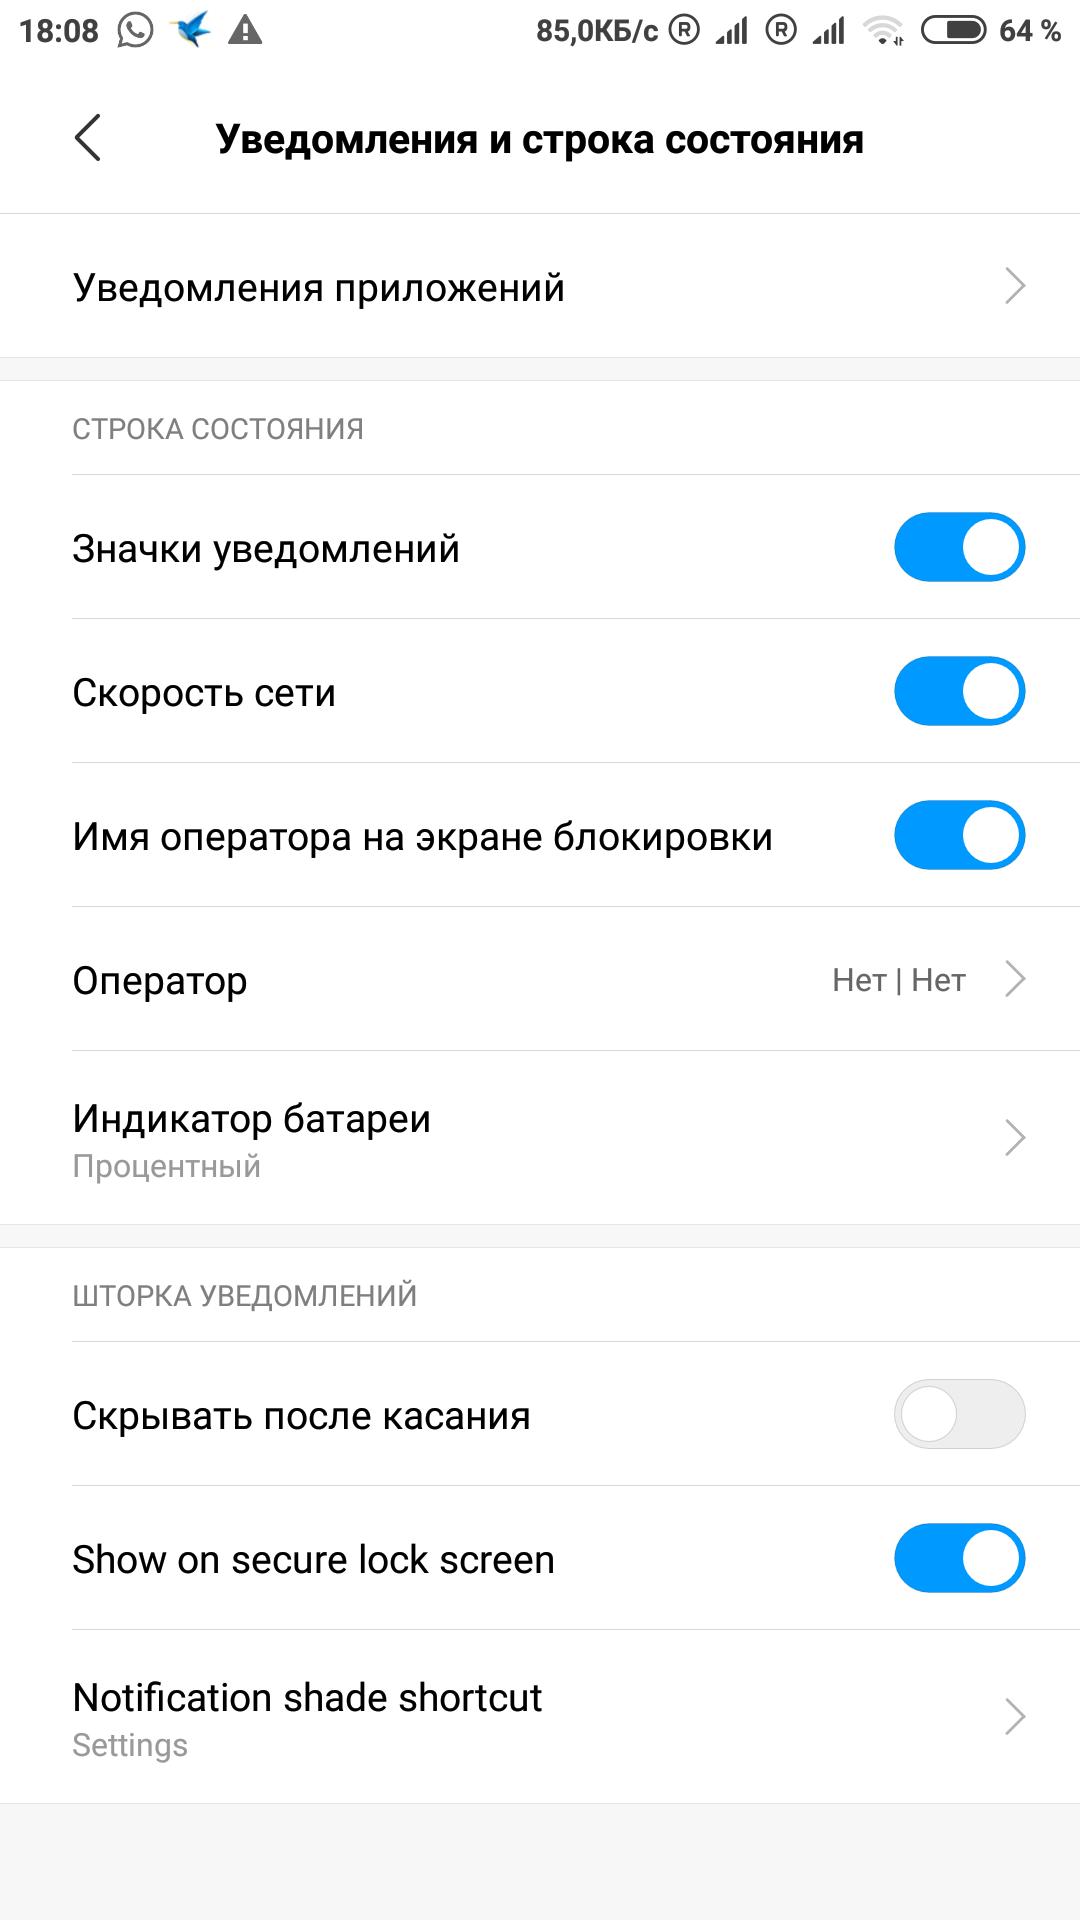 Screenshot_2018-07-21-18-08-07-113_com.android.settings.png